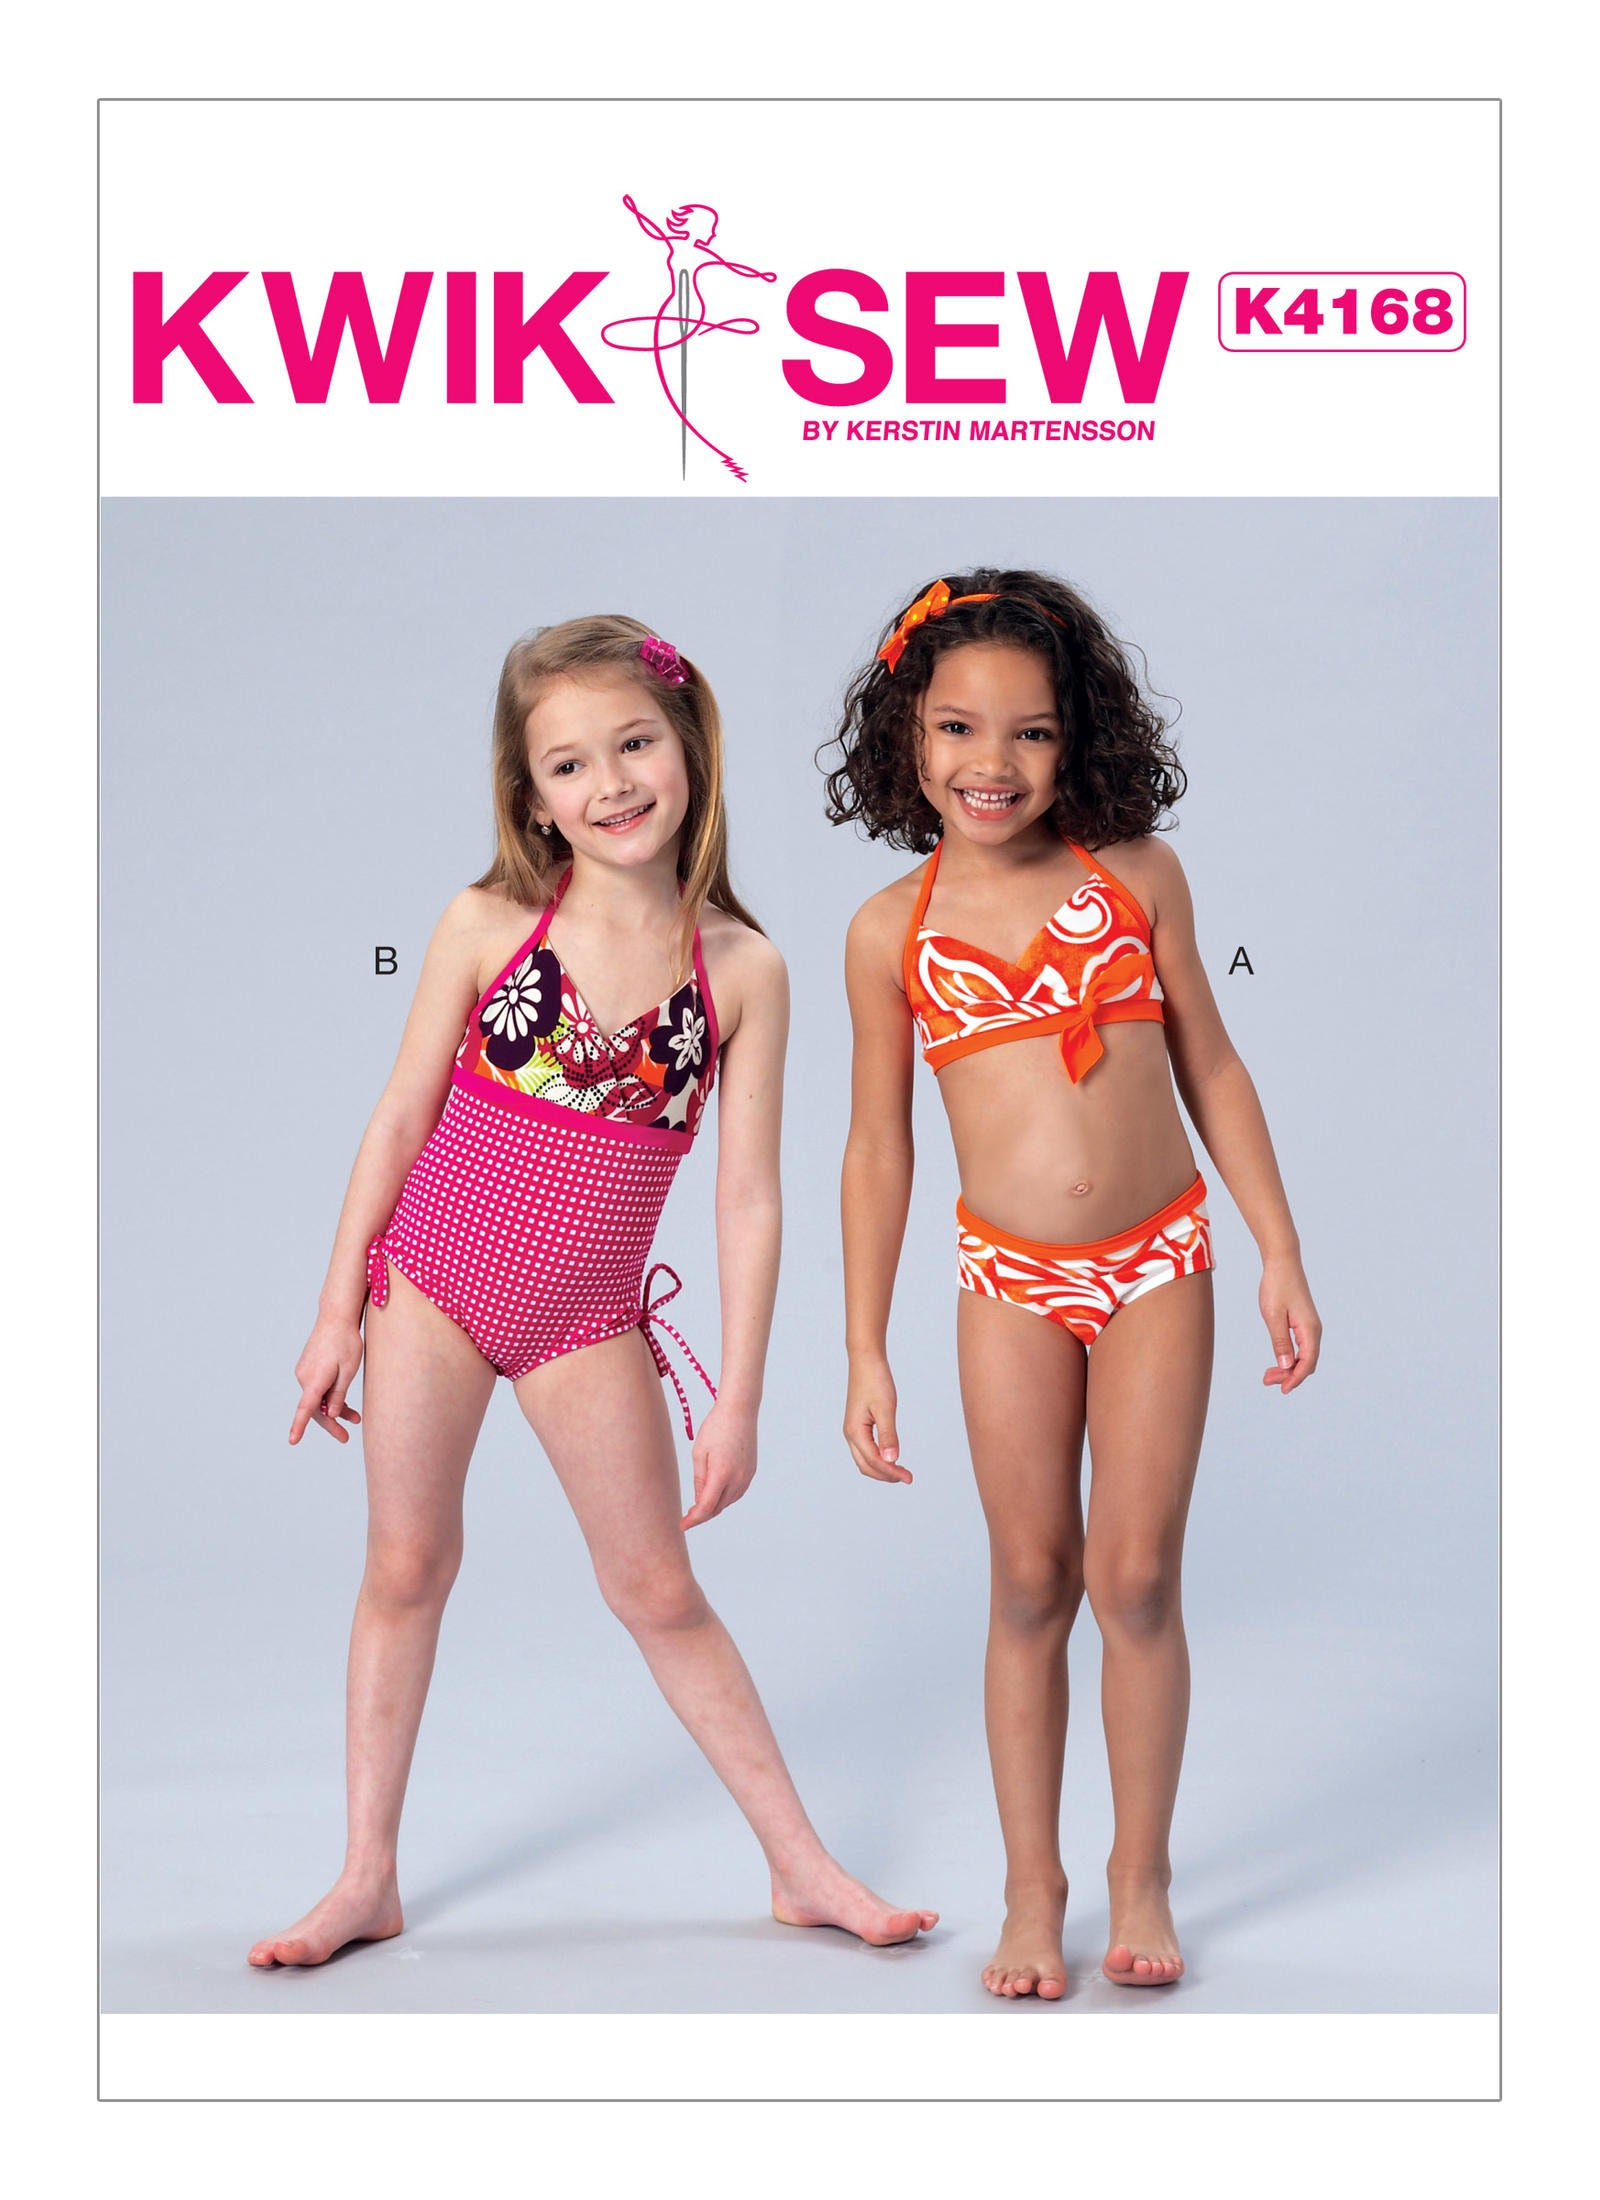 Sewing pattern for girls halter bikini one piece swimsuit kwik sewing pattern for girls halter bikini one piece swimsuit kwik sew pattern 4168 girls swim suit pattern jeuxipadfo Gallery